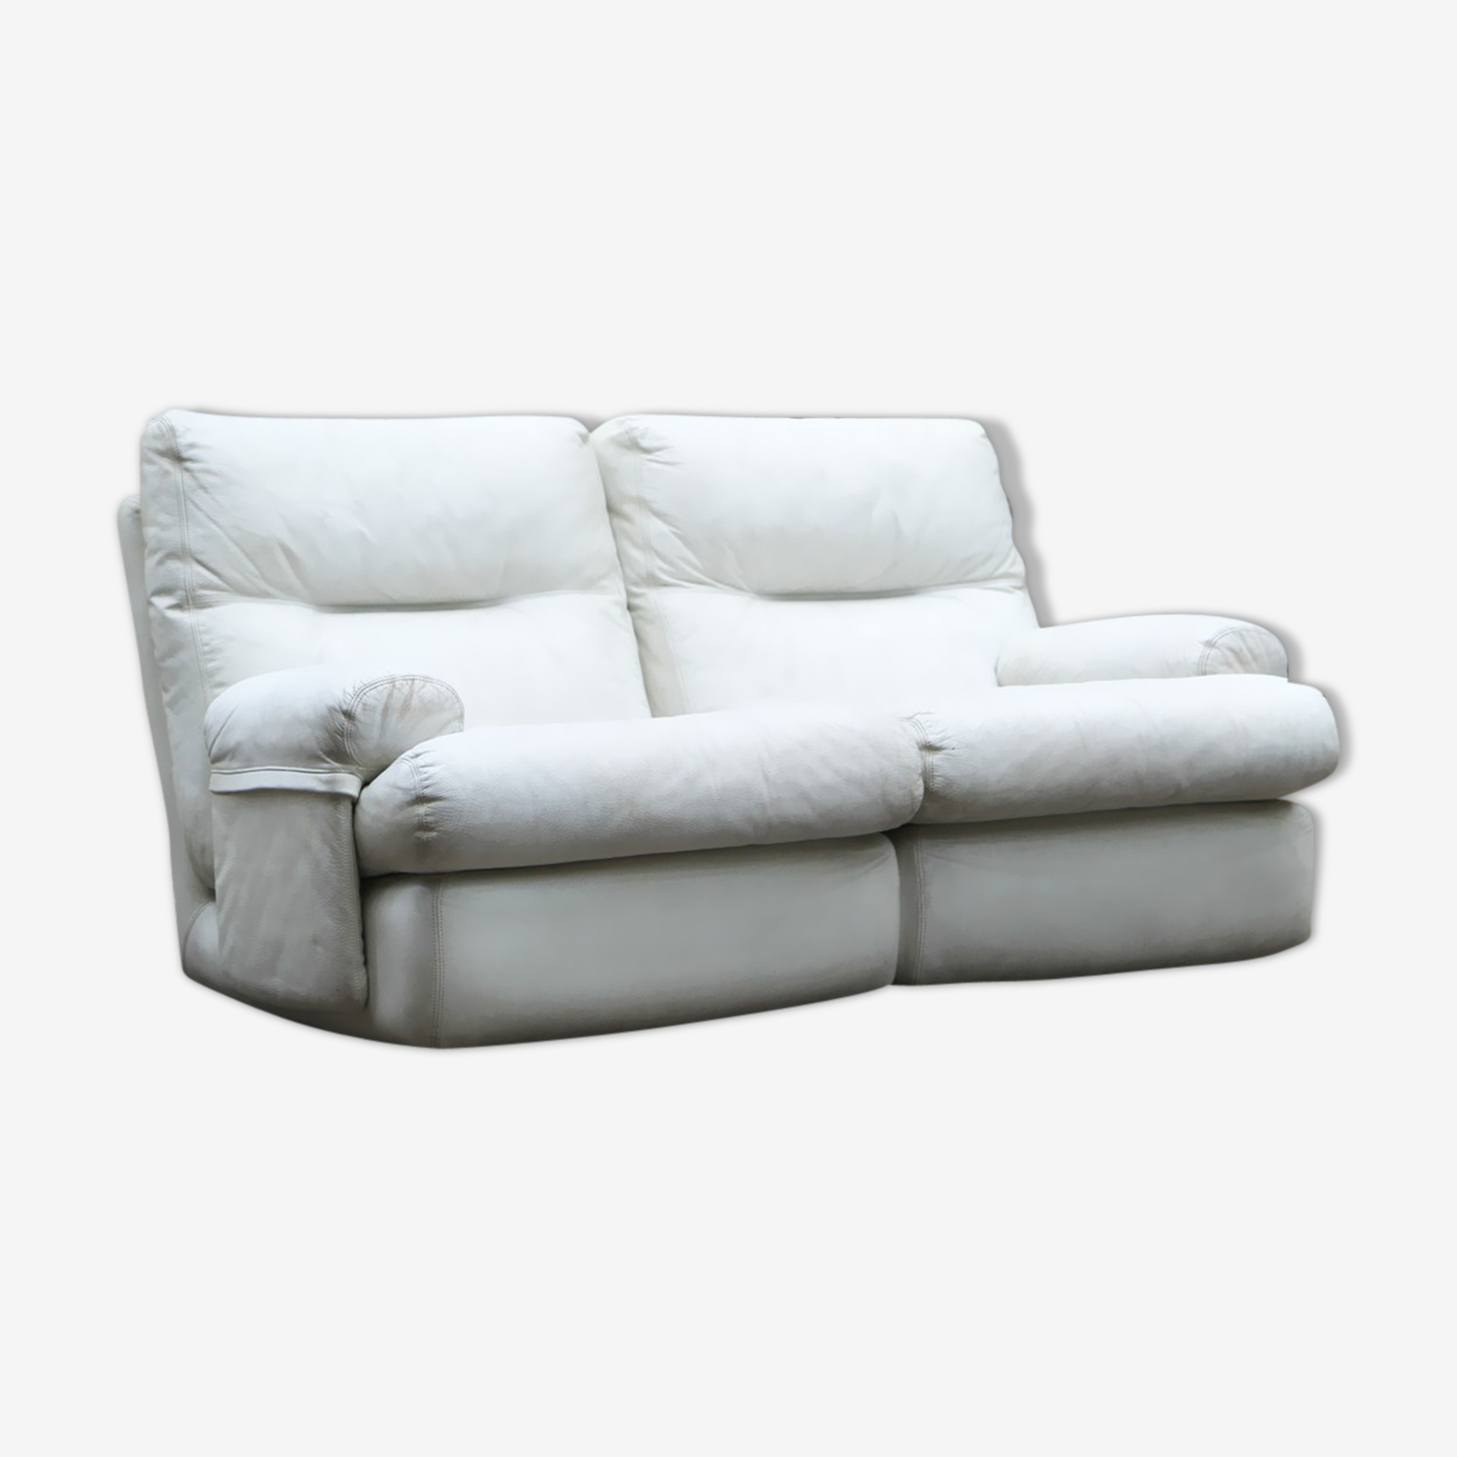 Ligne Roset white leather sofa